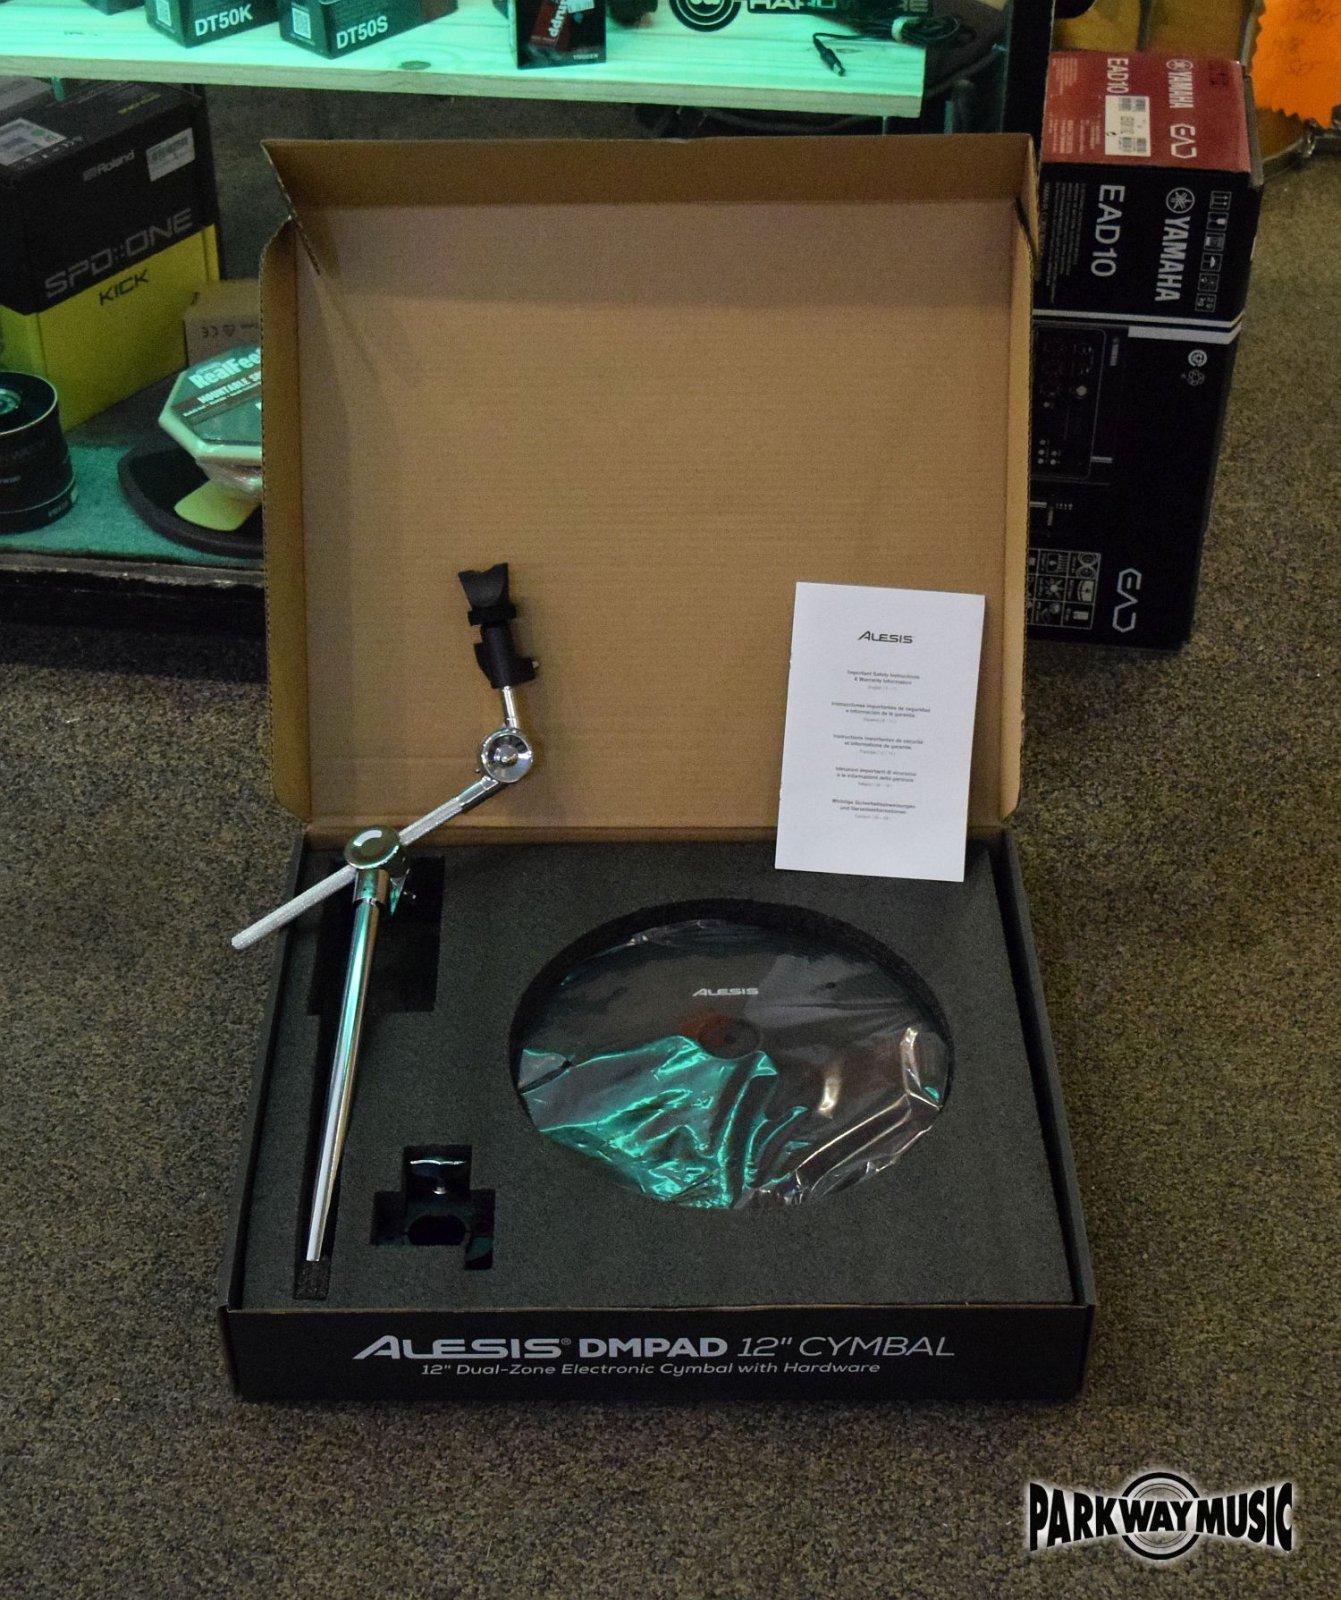 Alesis DMPad 12 cymbal w Mount